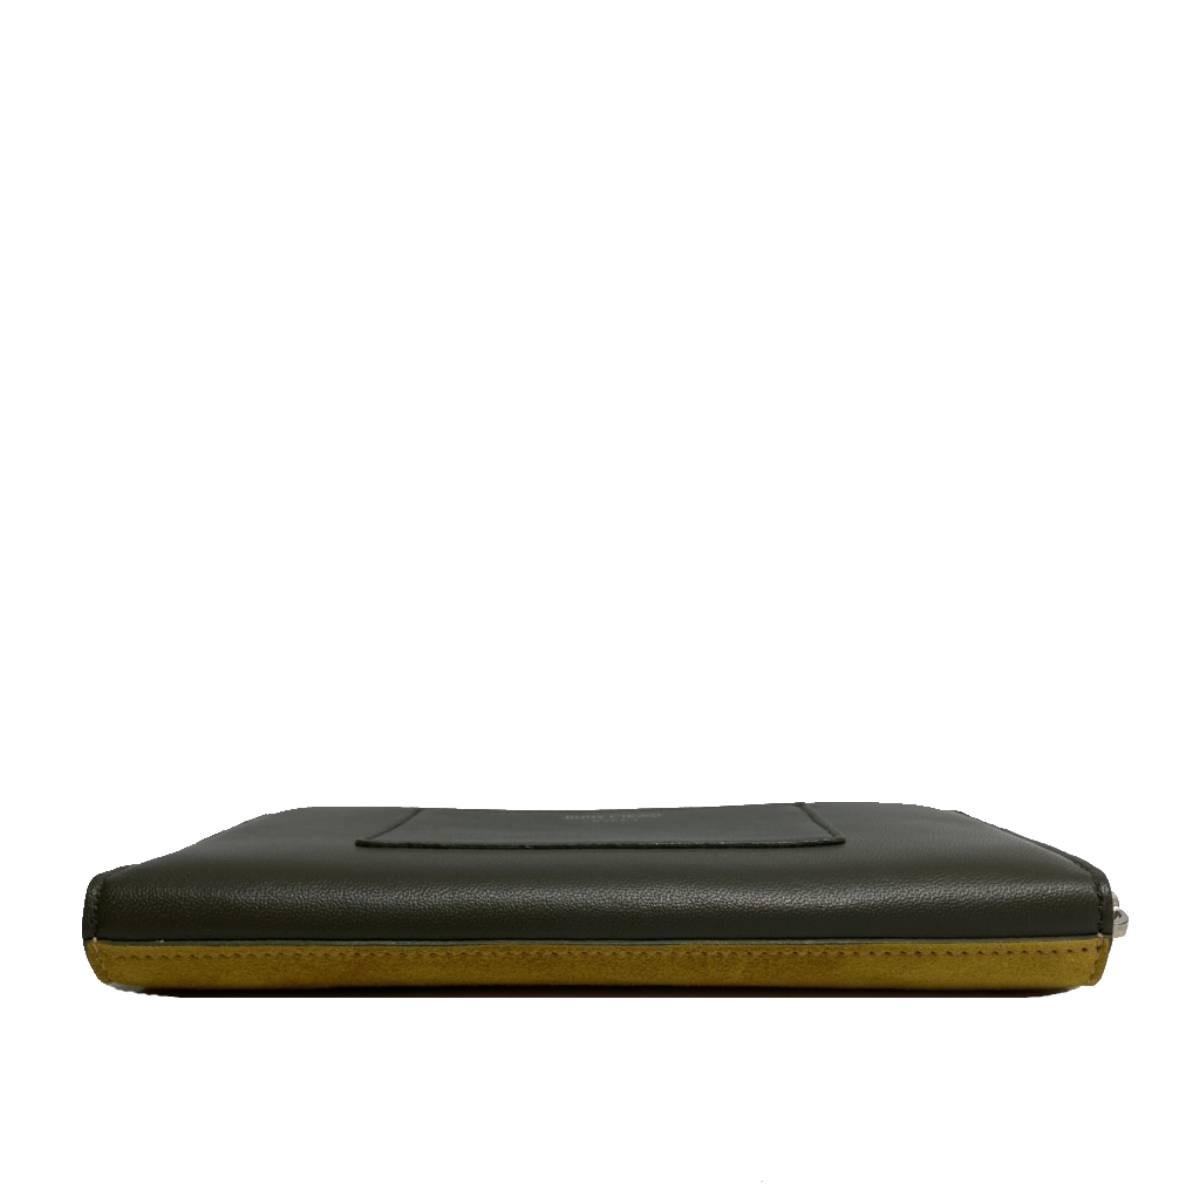 【SALE】【中古】 JIMMY CHOO ジミーチュー MILLY NSU ラウンドファスナー長財布 財布 長財布(小銭入有) MILLY Khaki/カーキ イエロー レザー スエード 0C2851 used:A